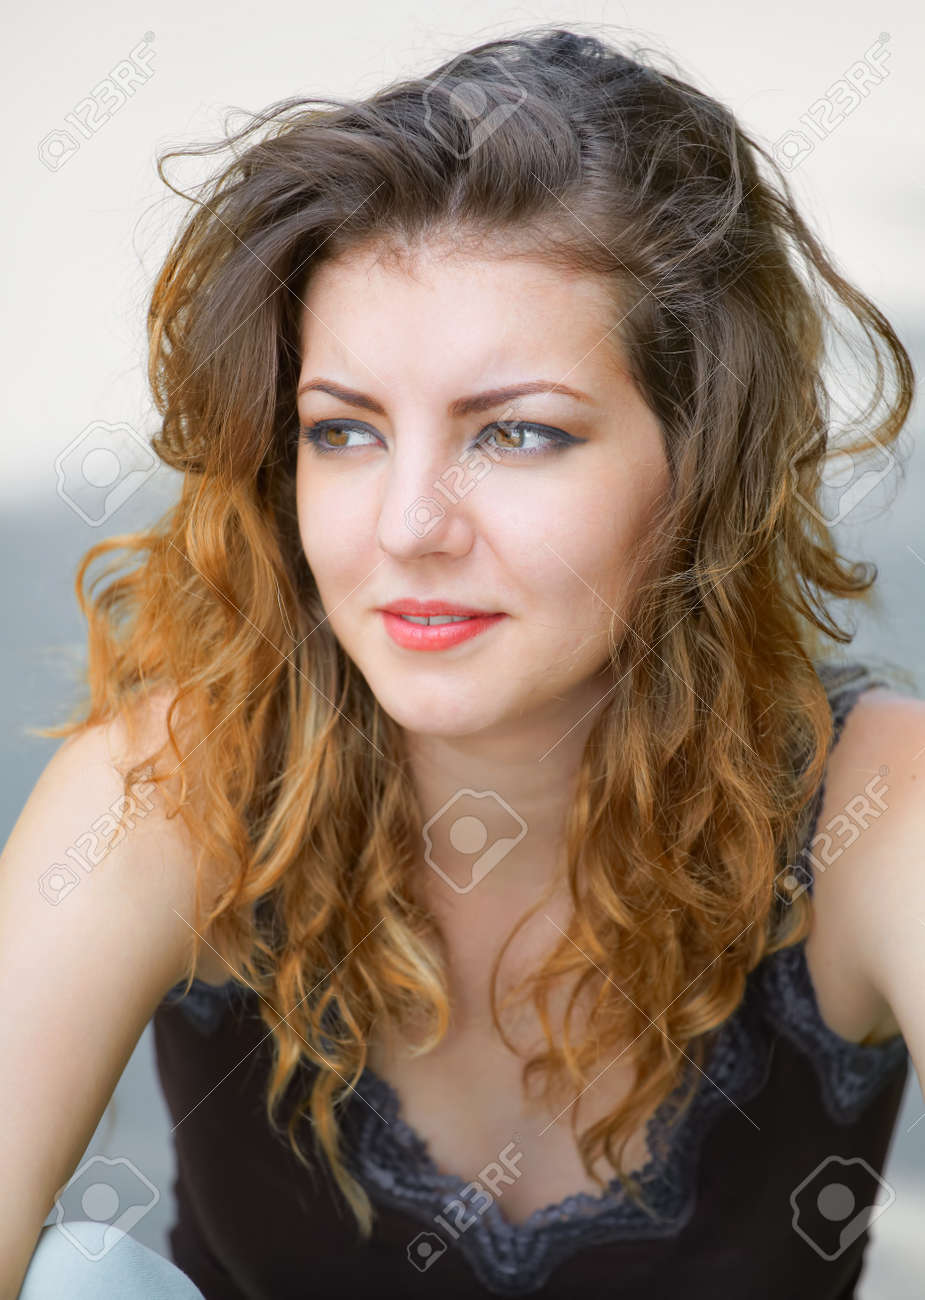 20 year old female